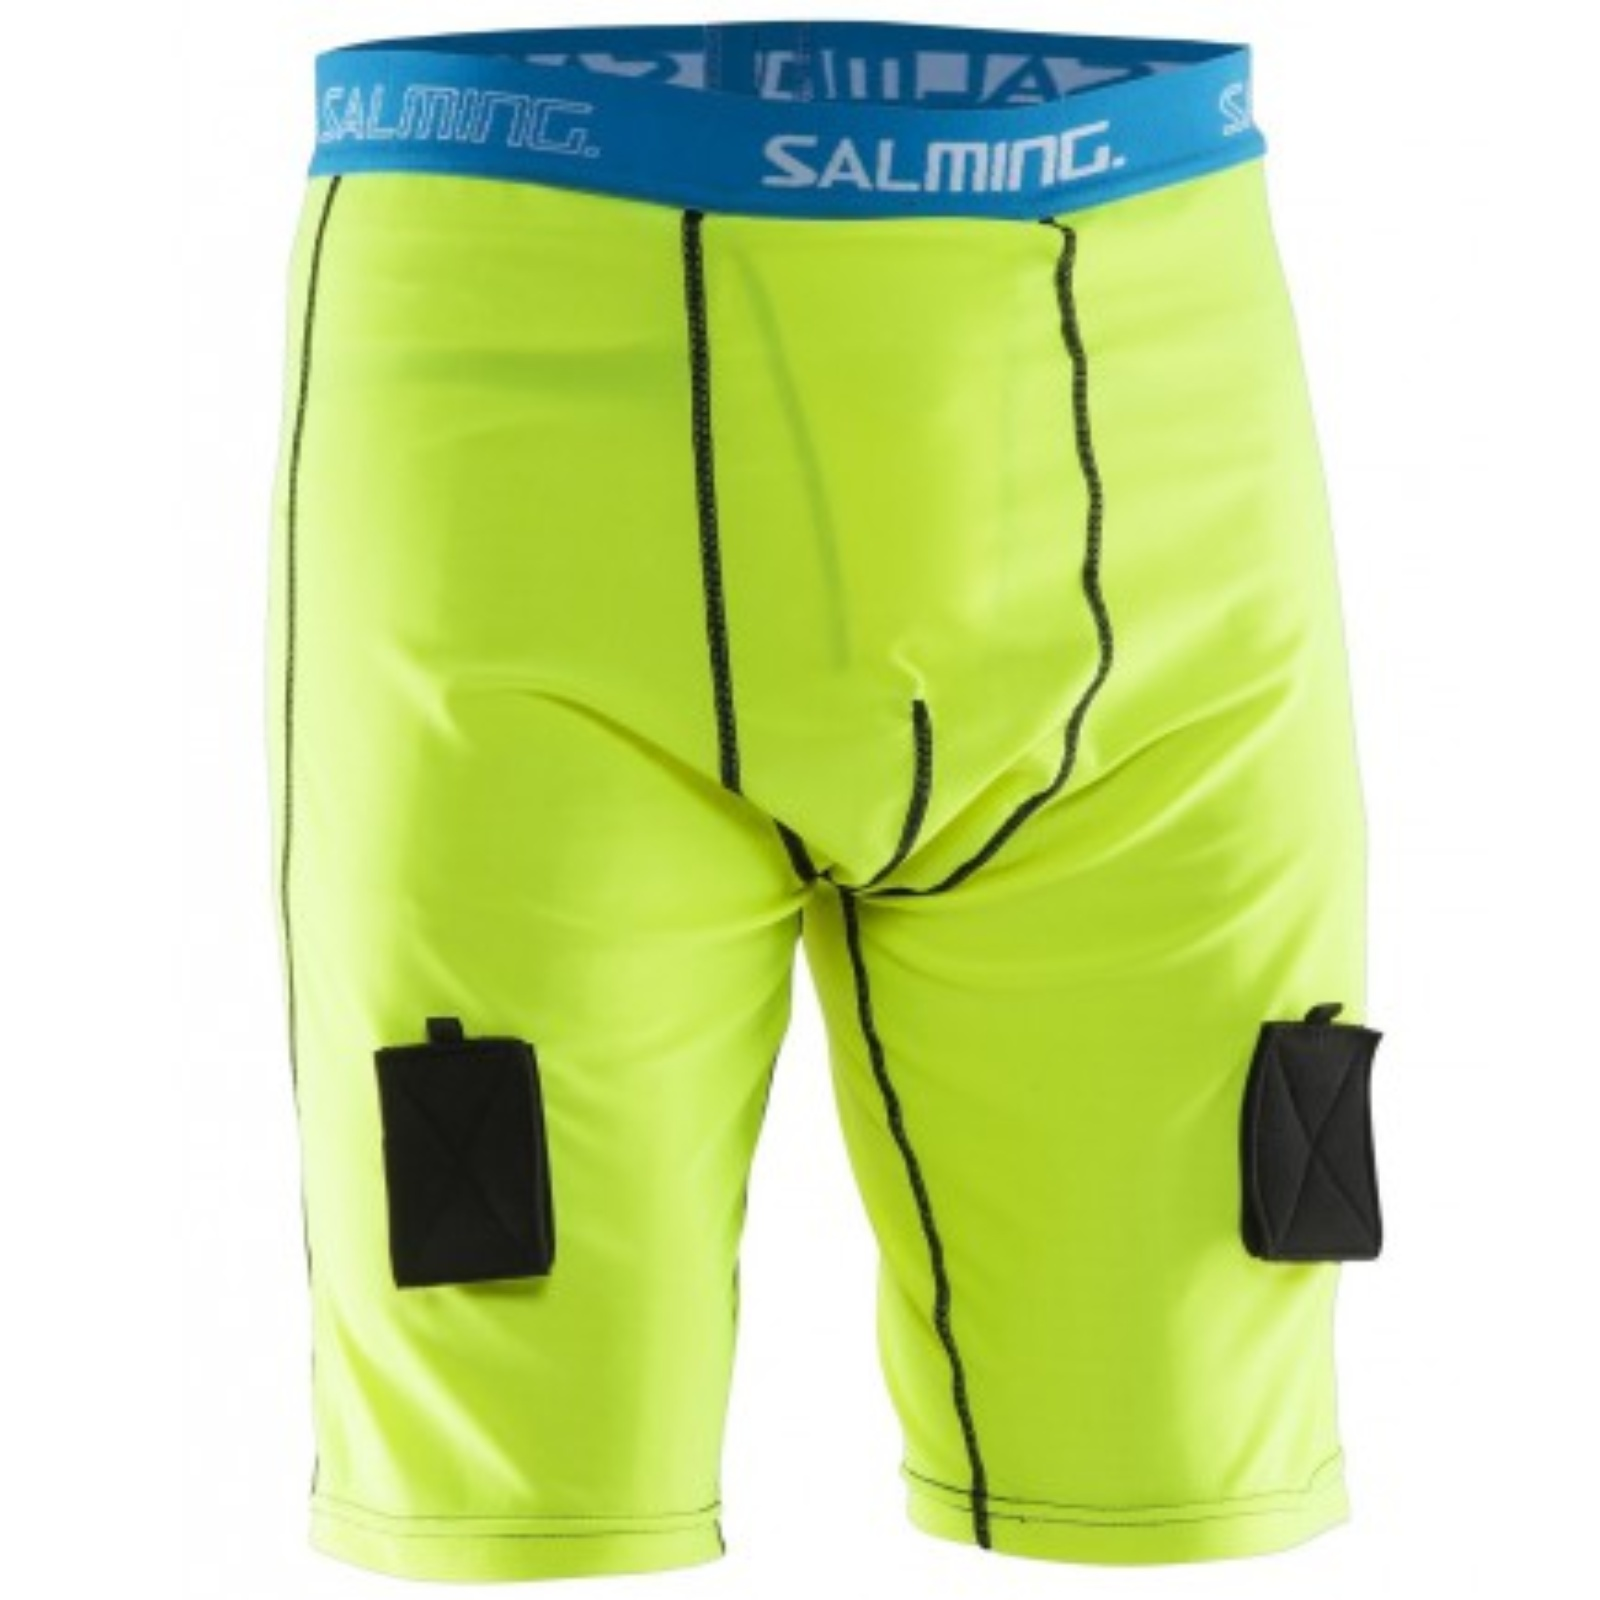 Hokejové šortky SALMING Comp Jock Short Pant junior